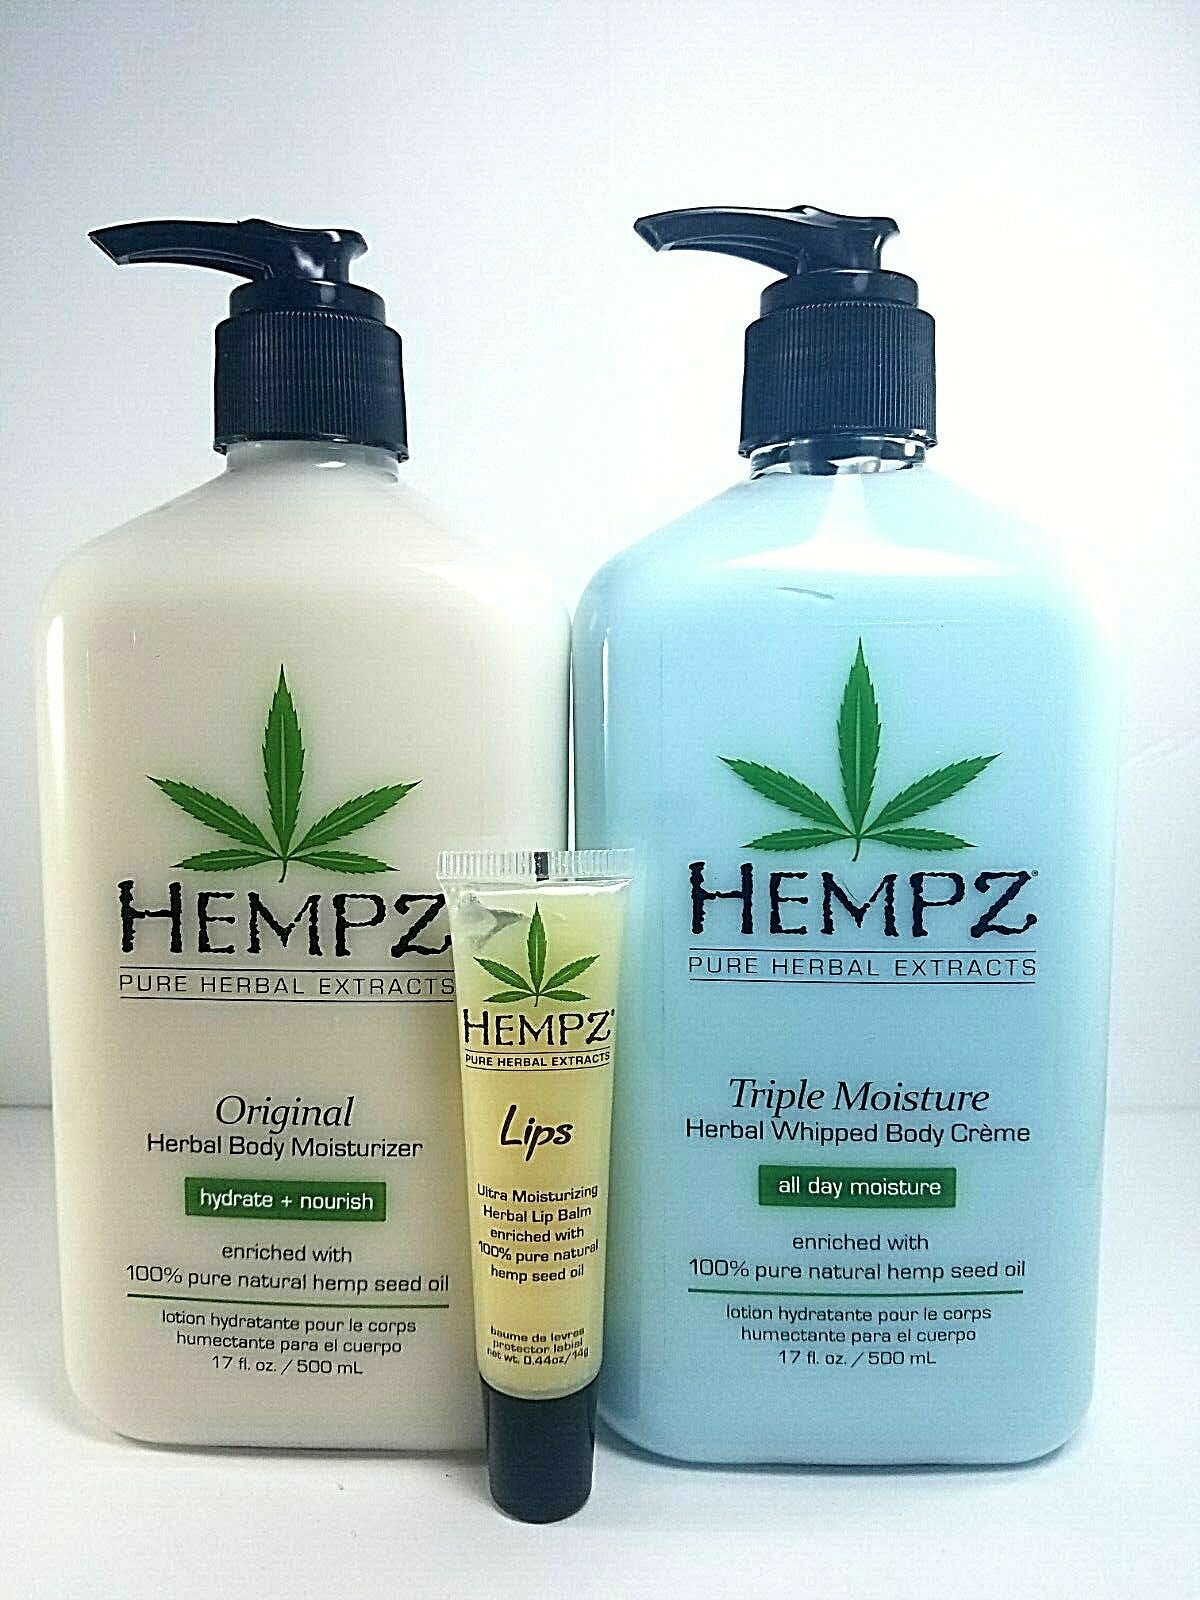 Hempz Original body lotion + Triple Moisturizer + lip balm g